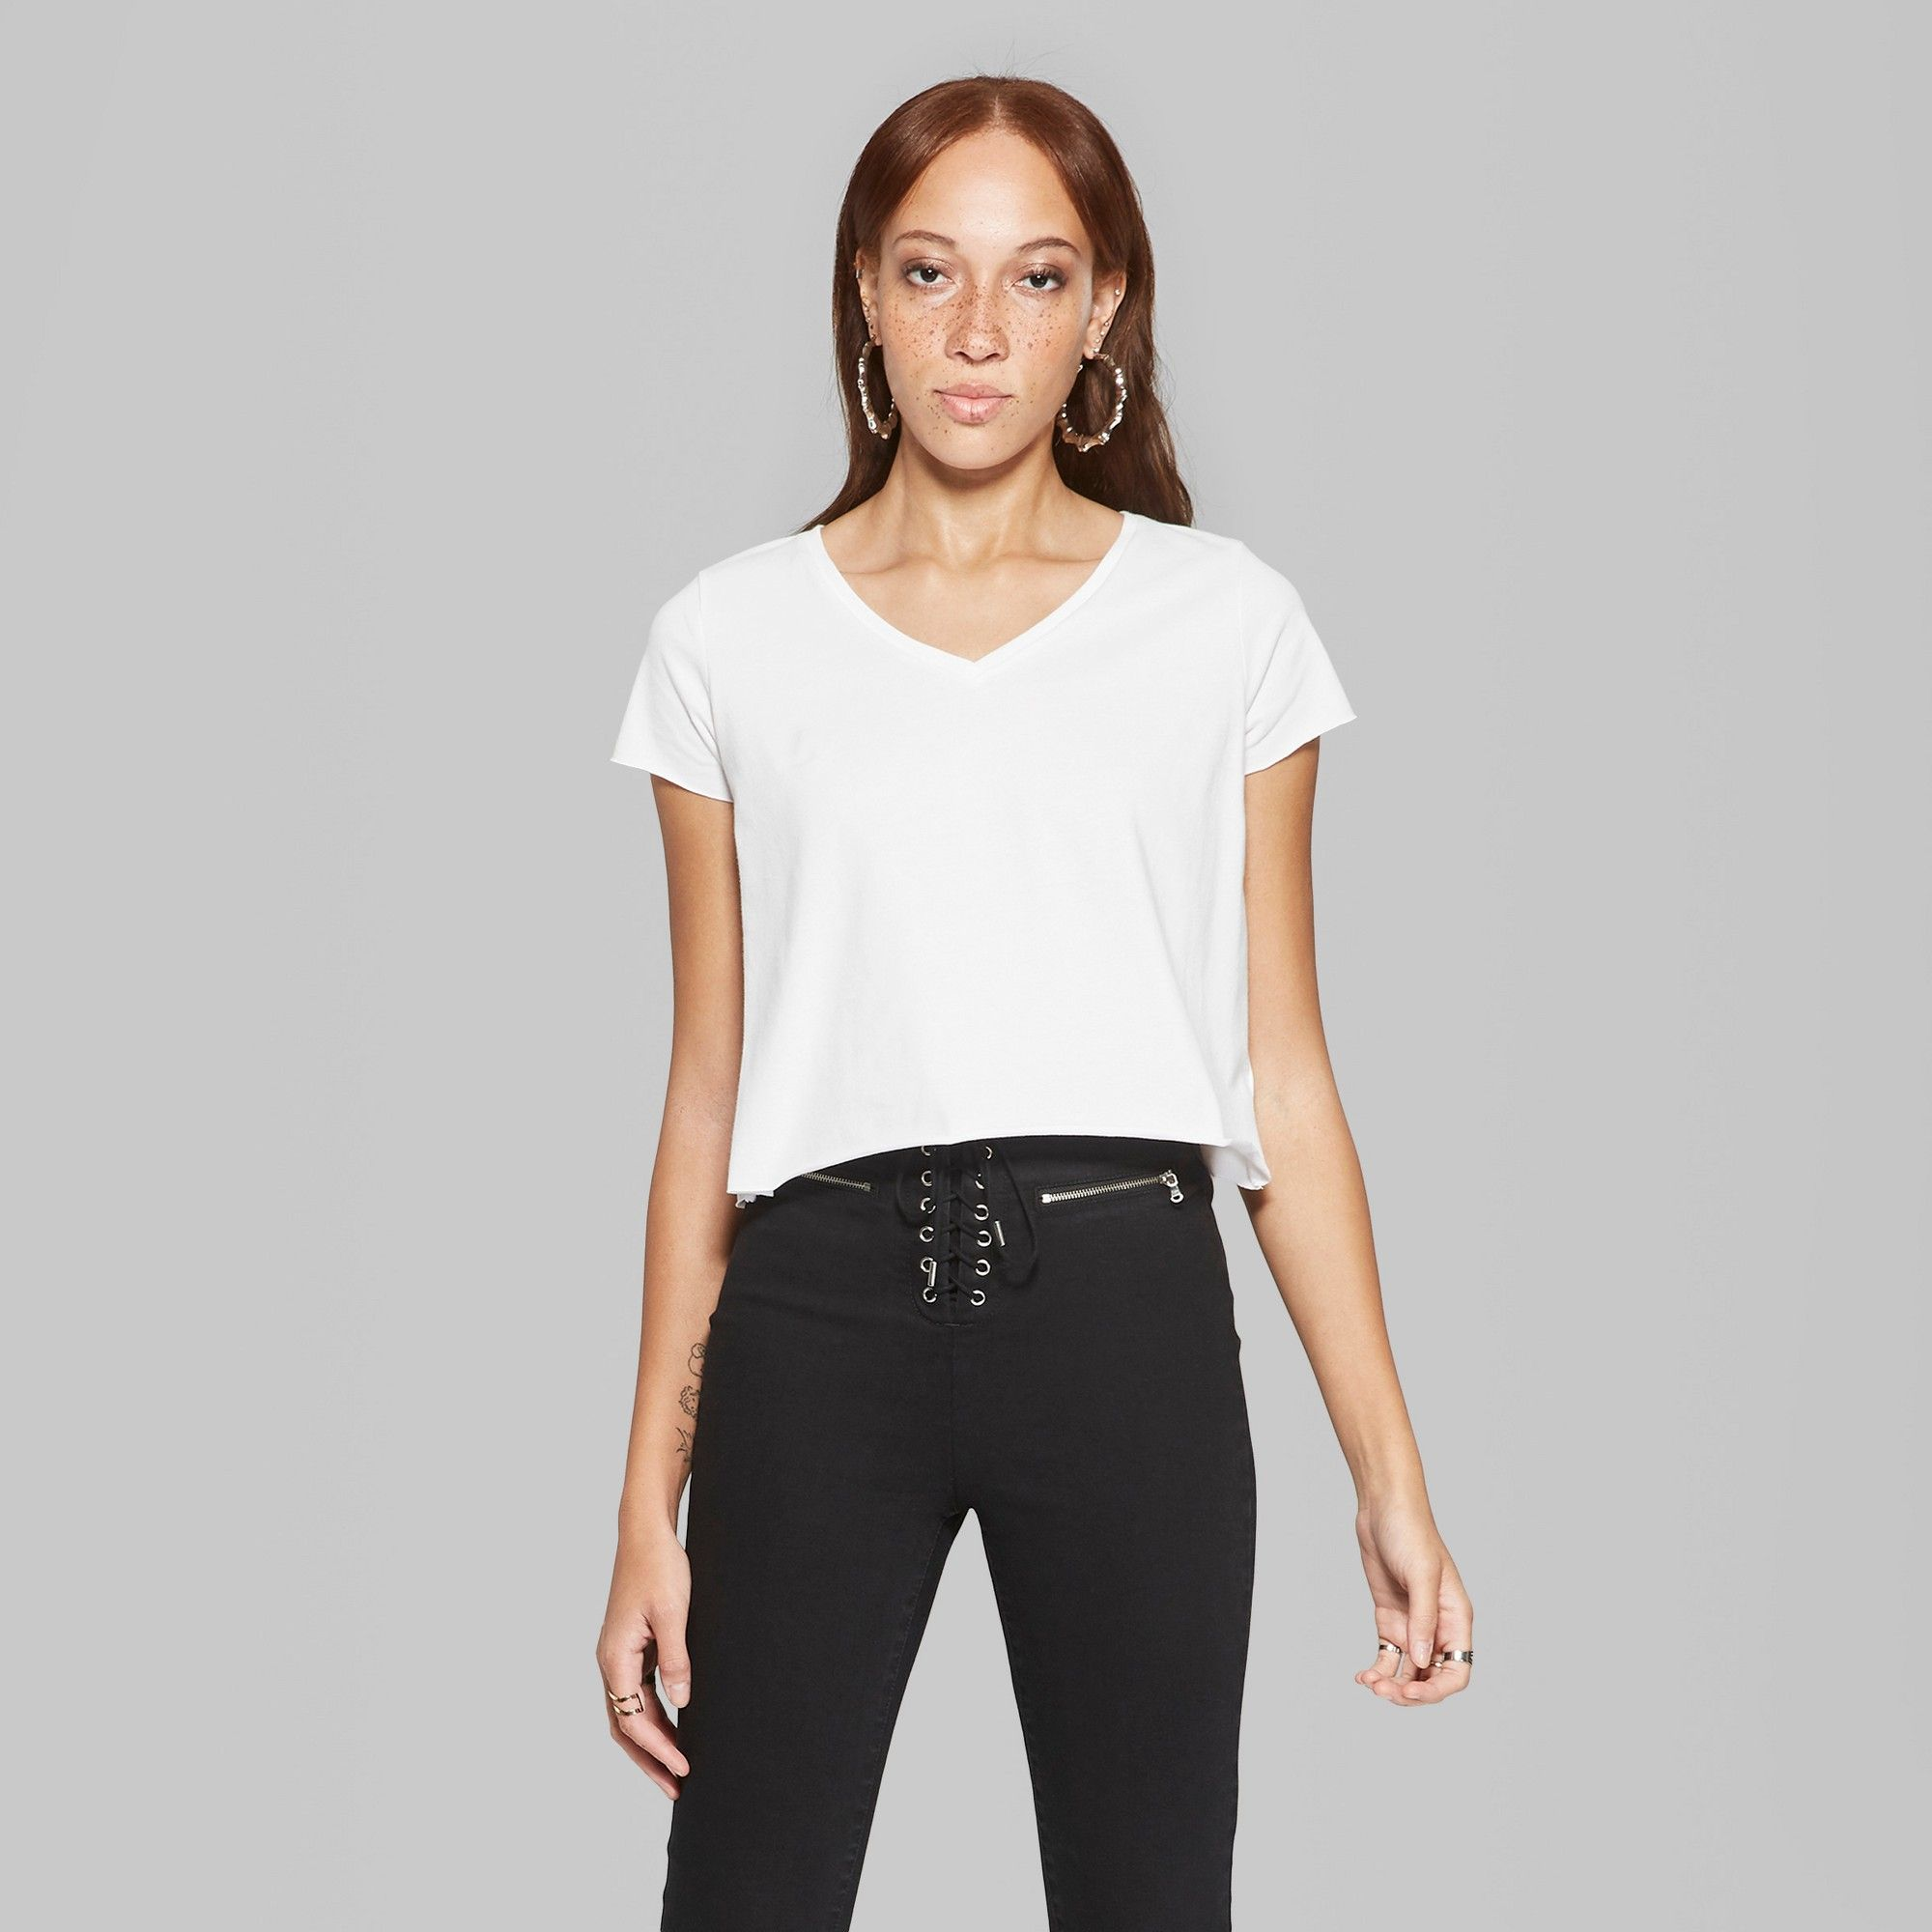 7f9ff6390d Women's Basic Sleeve V-Neck Boxy T-Shirt - Wild Fable White XS. Women's  Cropped Short ...